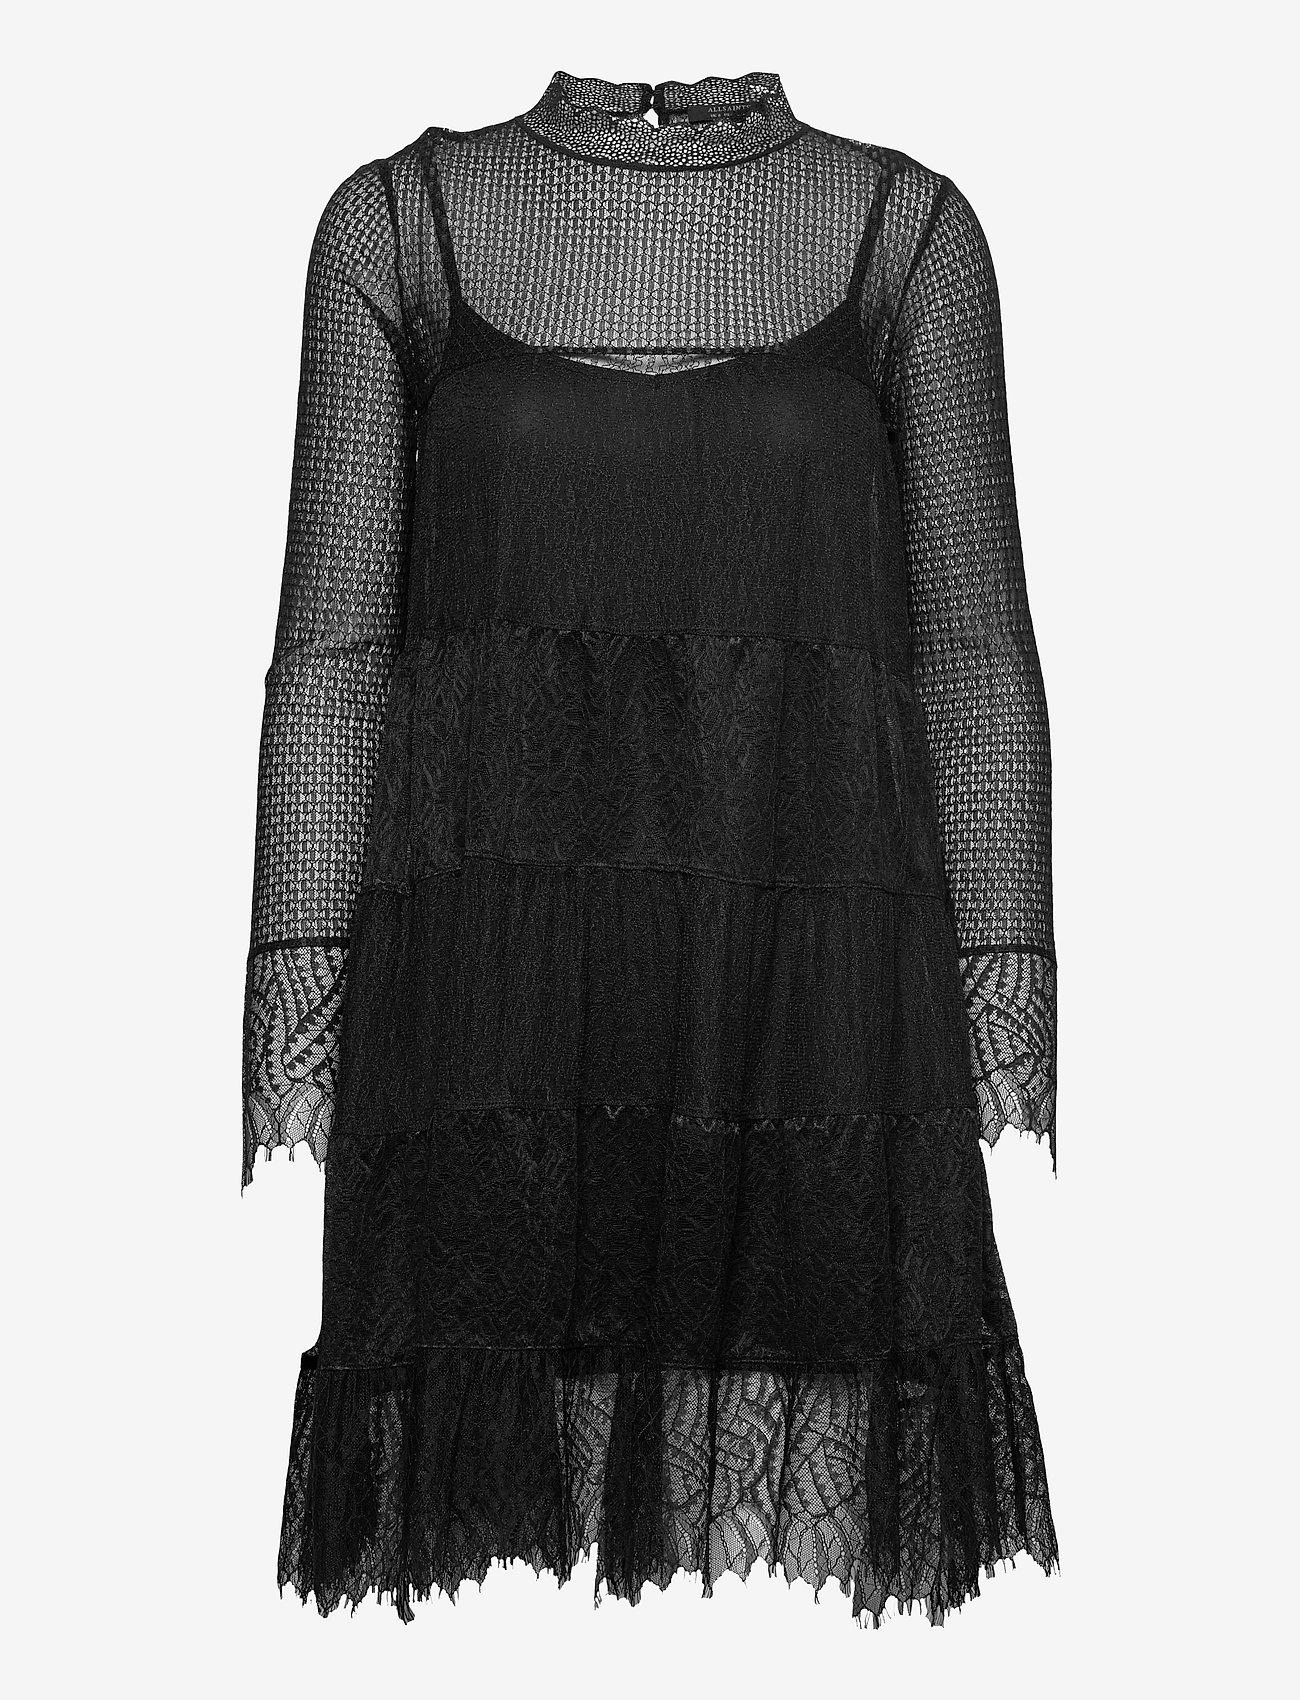 AllSaints - BRIELLA DRESS - blondekjoler - black - 1